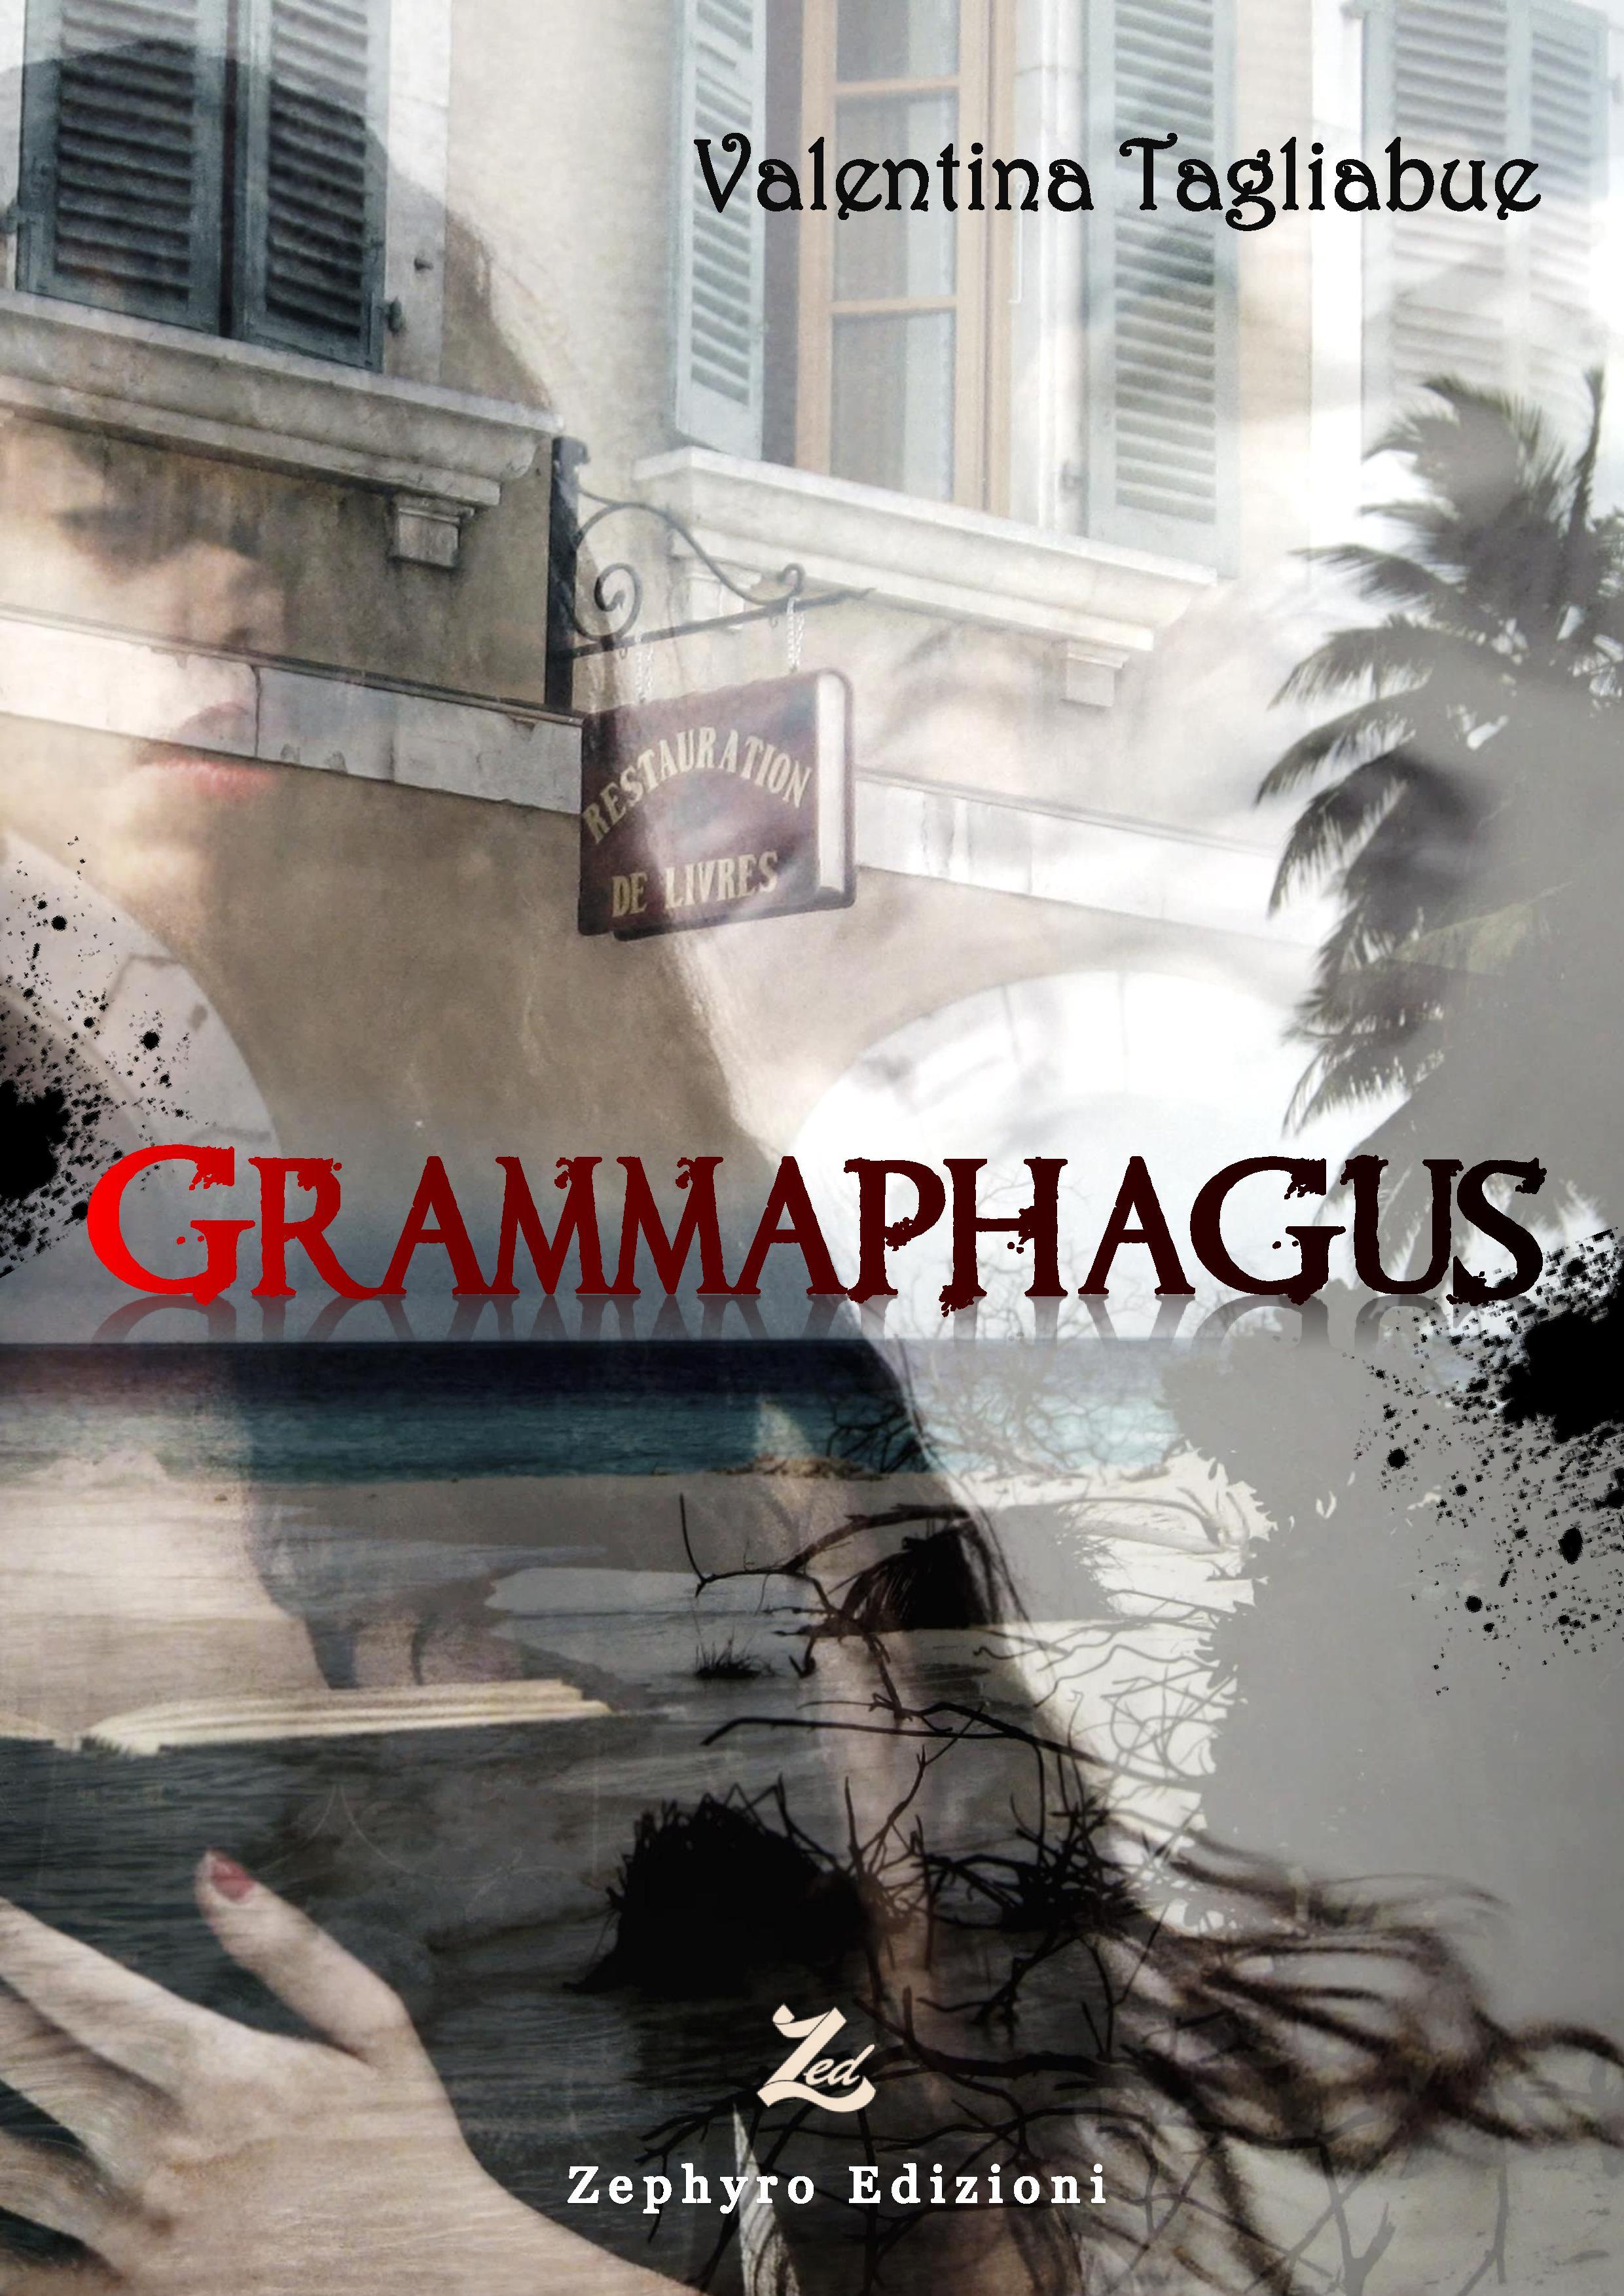 Grammaphagus